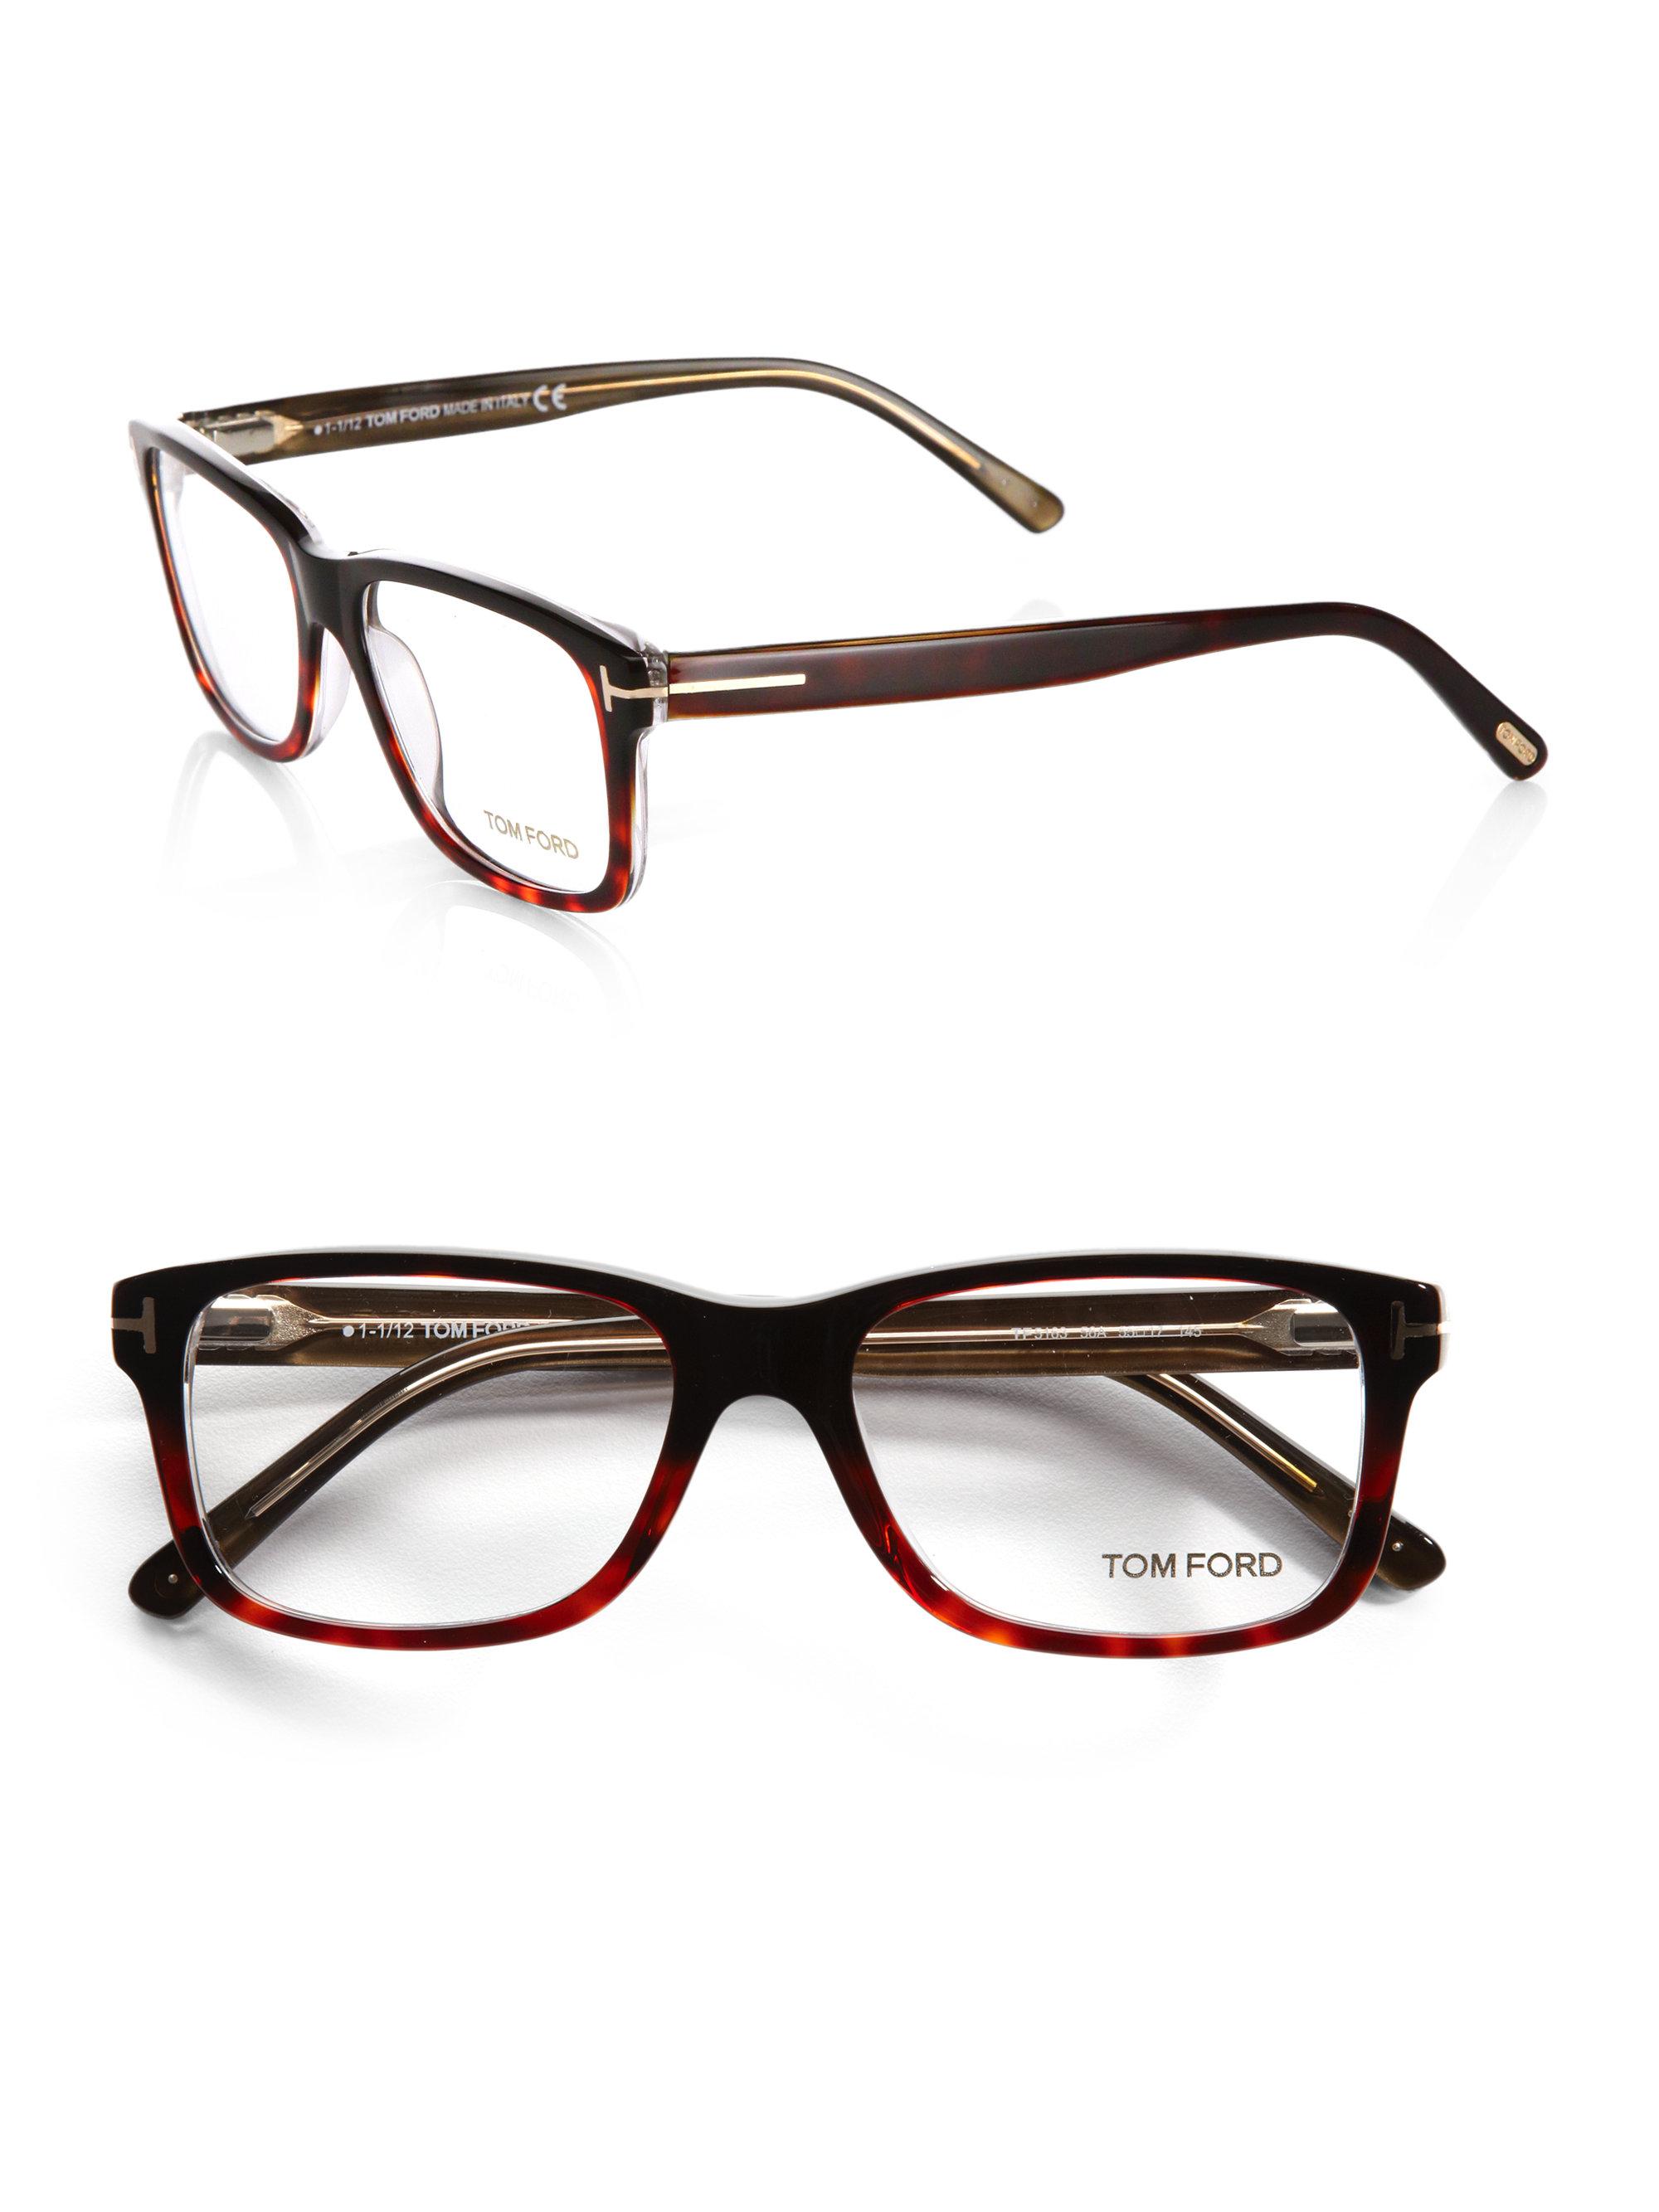 d6e193788f Lyst - Tom Ford 5163 Square Optical Frames in Brown for Men